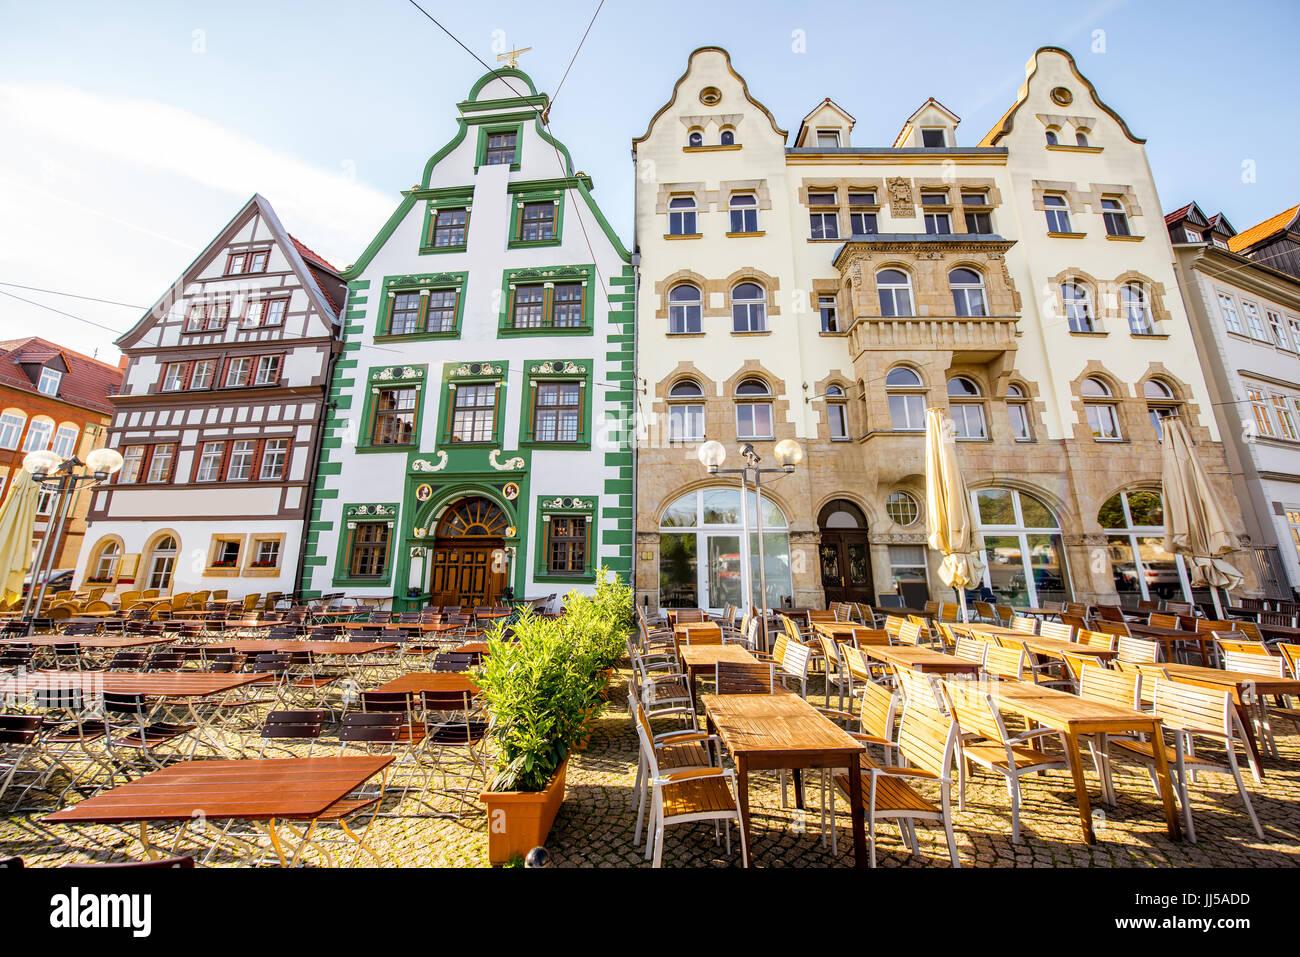 Erfurt-Stadt in Deutschland Stockbild